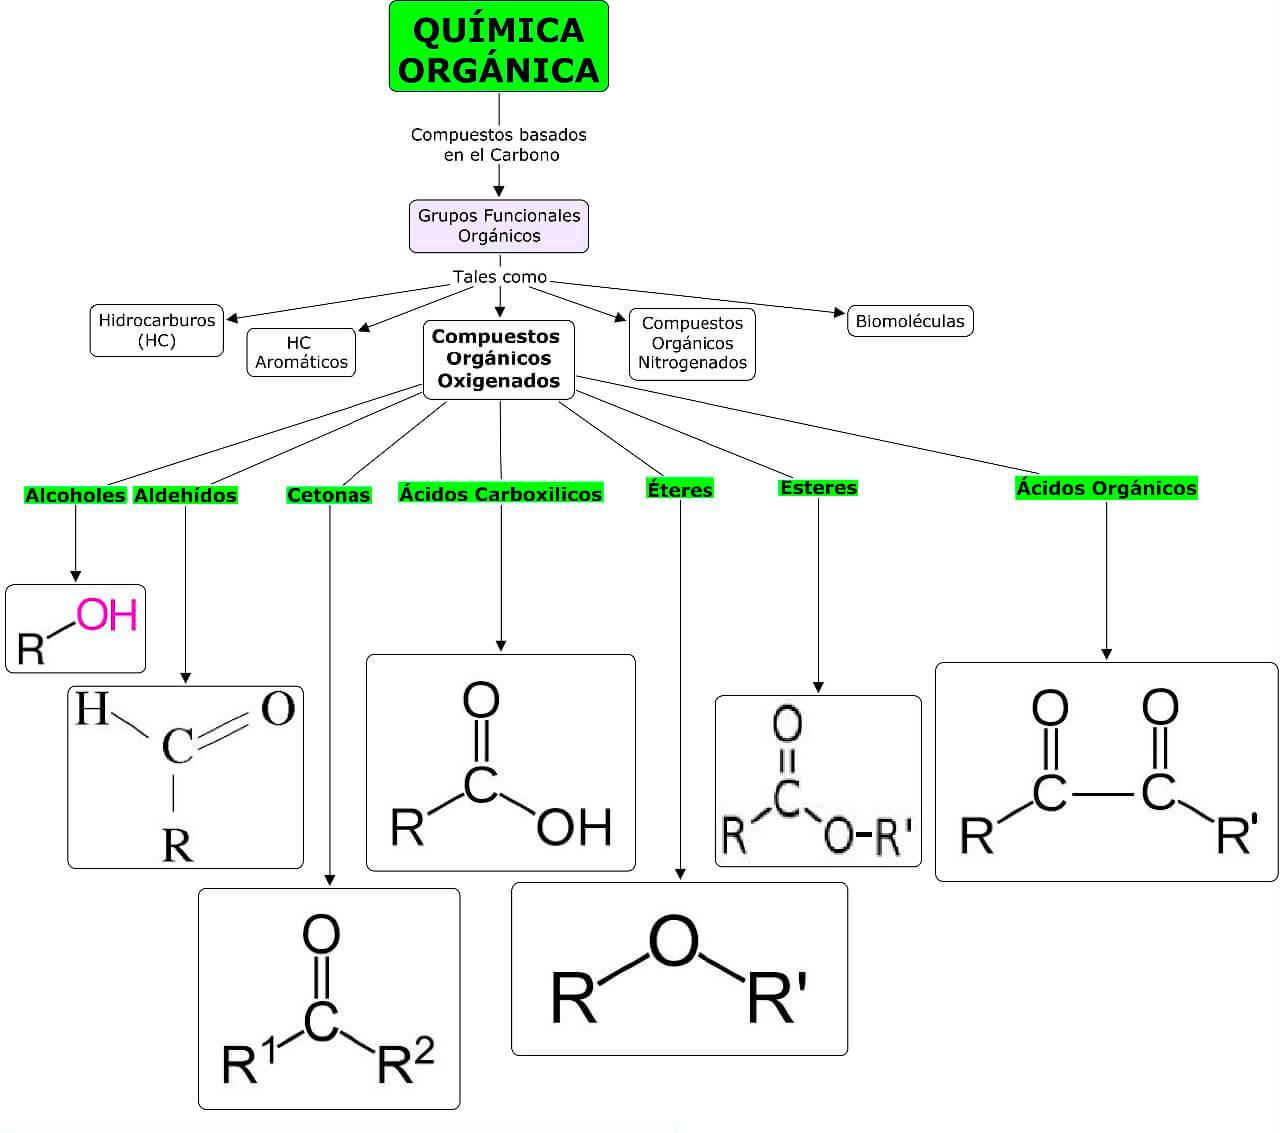 Mapa conceptual grupo funcionales orgánicos